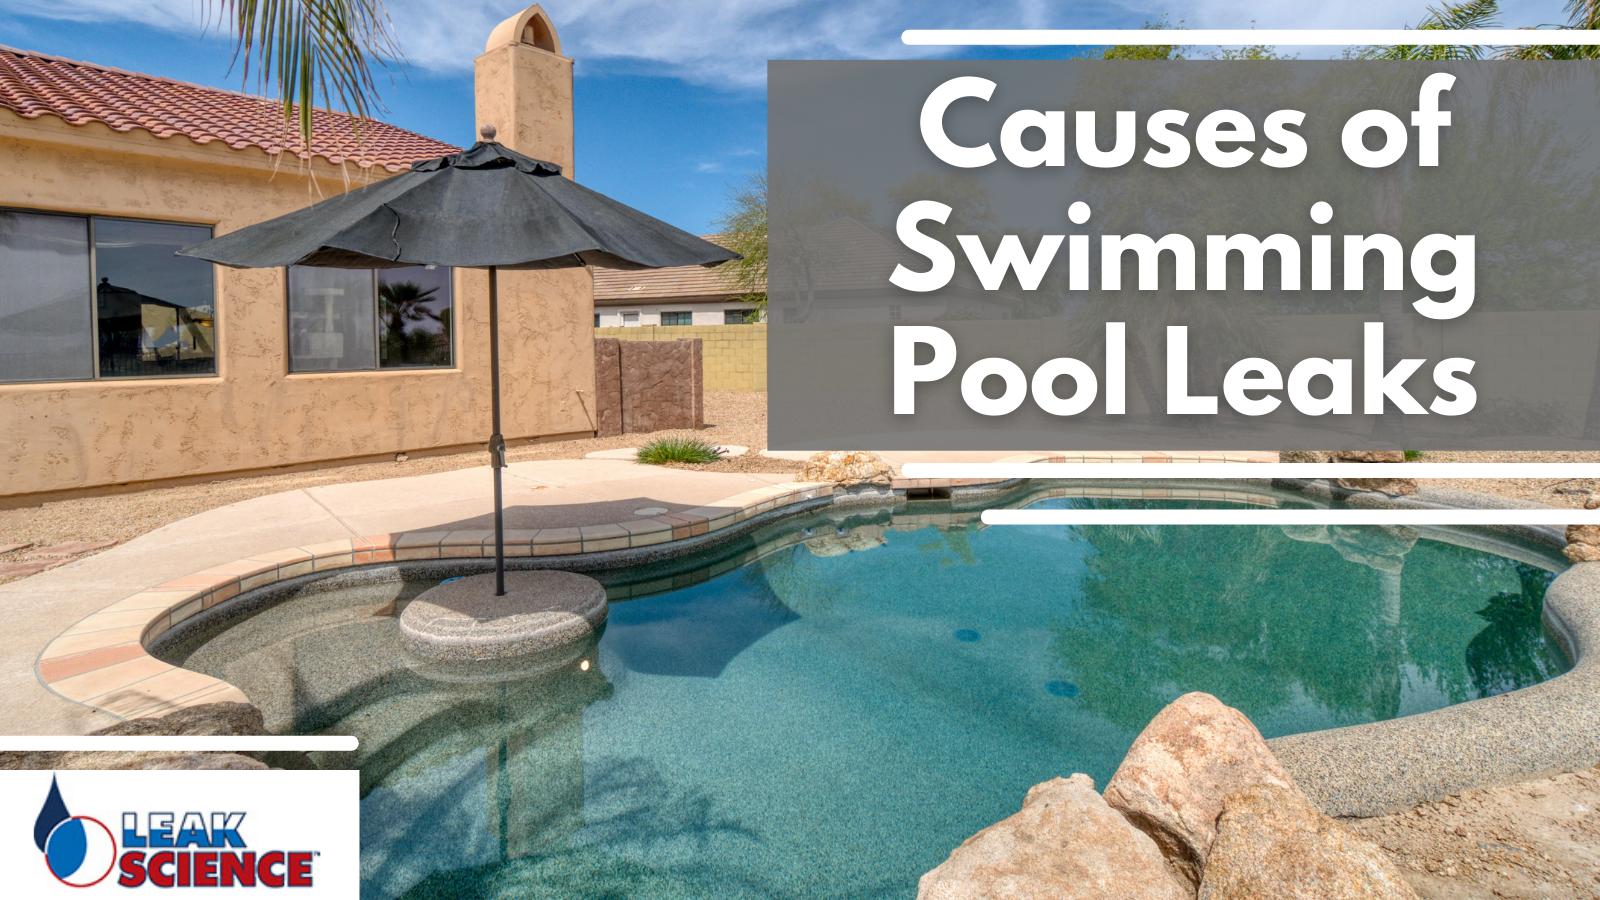 Causes of Swimming Pool Leaks